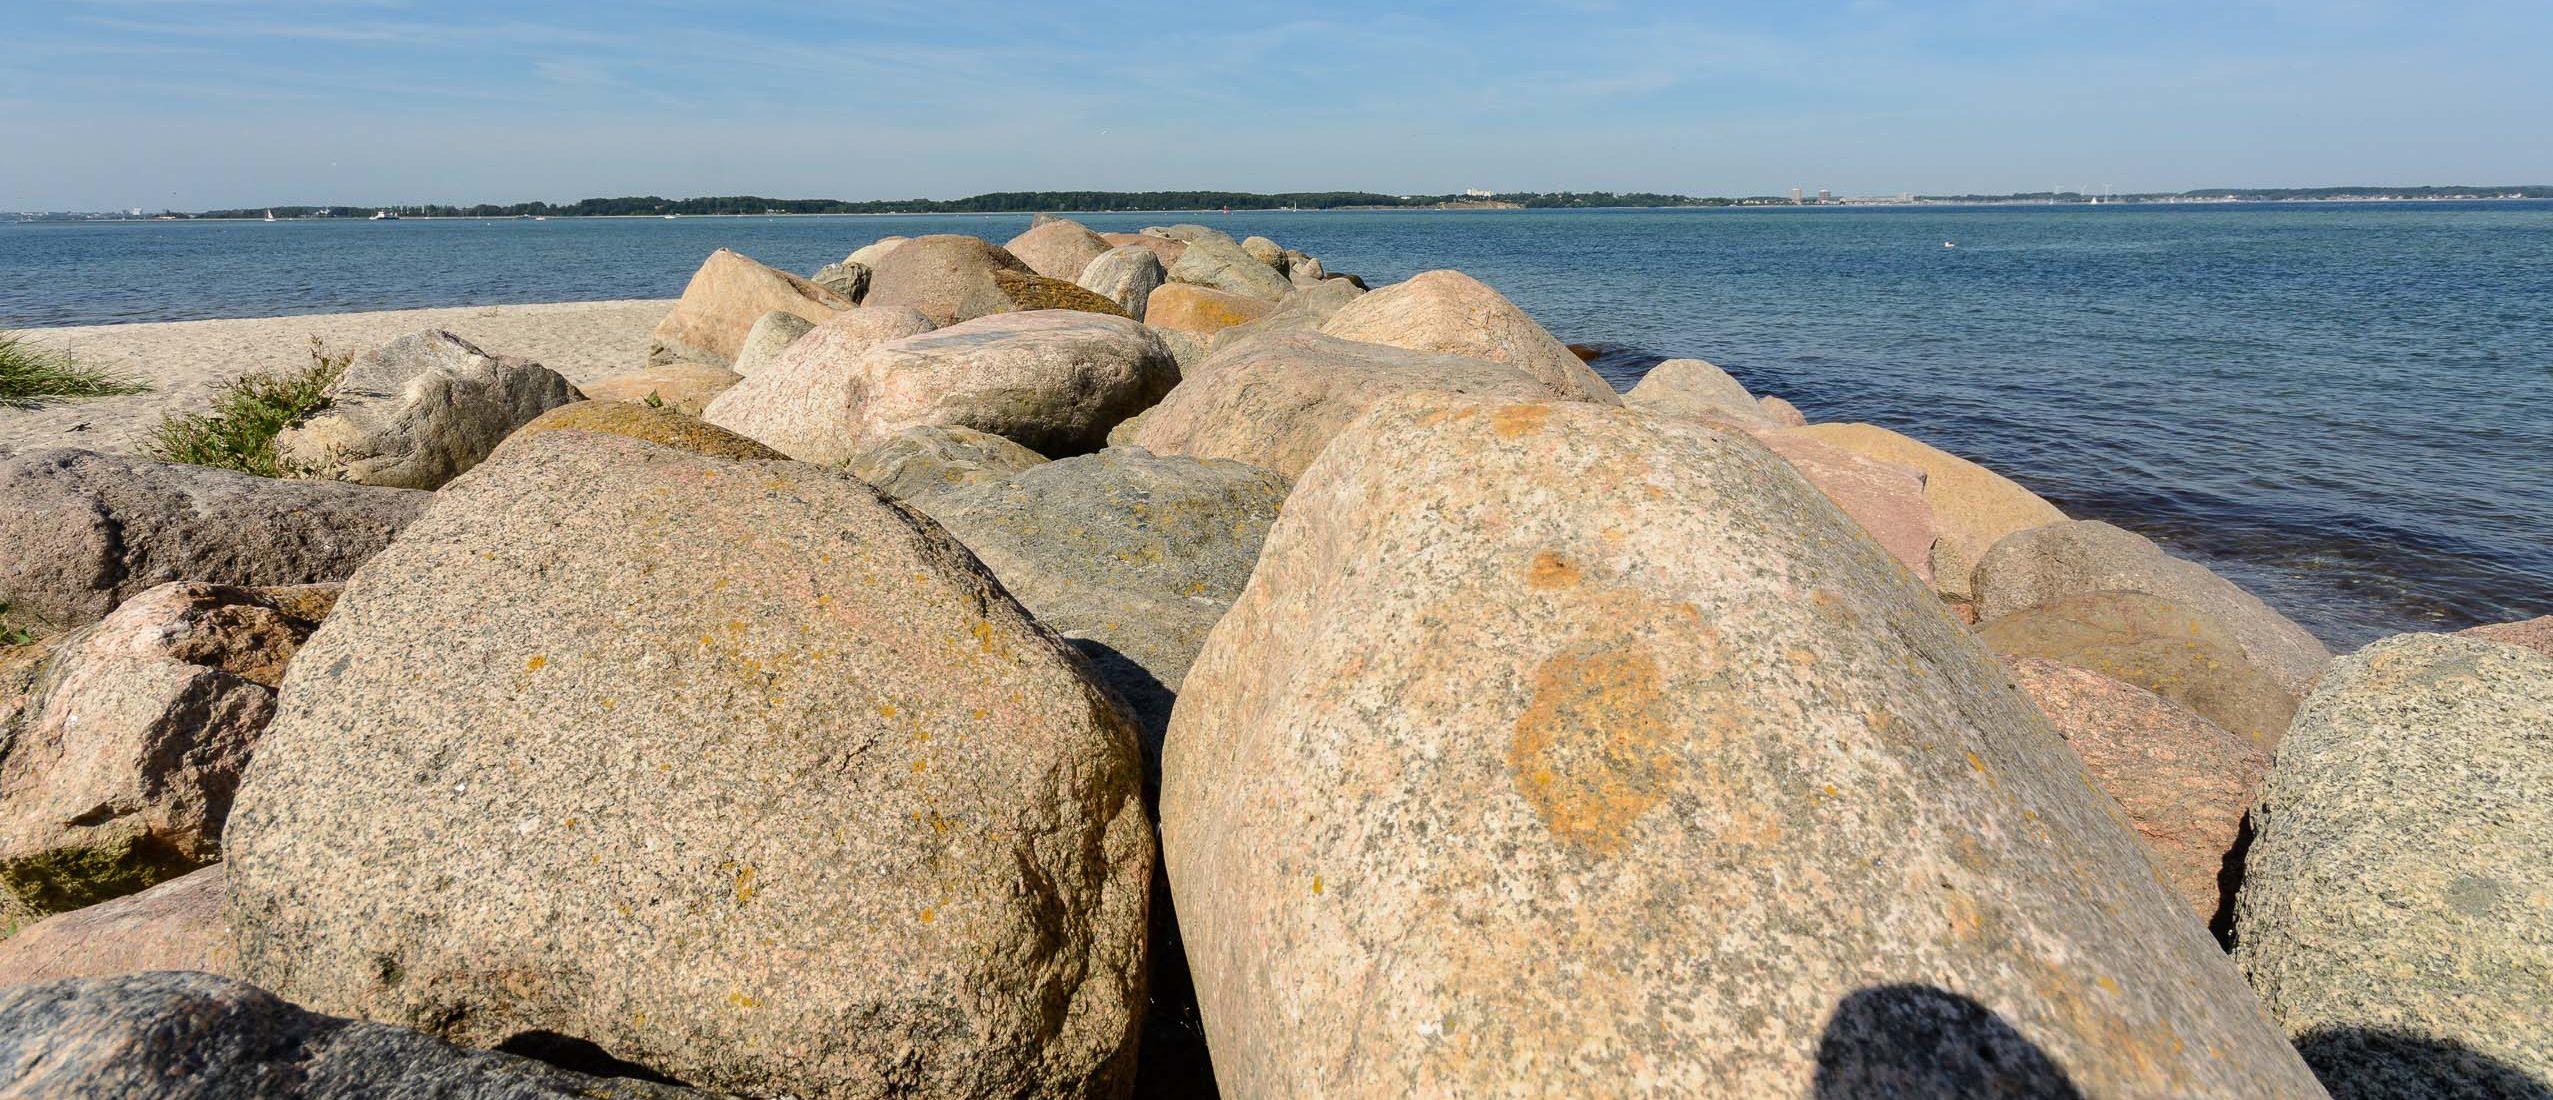 Felsen,Steine,meer,ostsee Urlaub